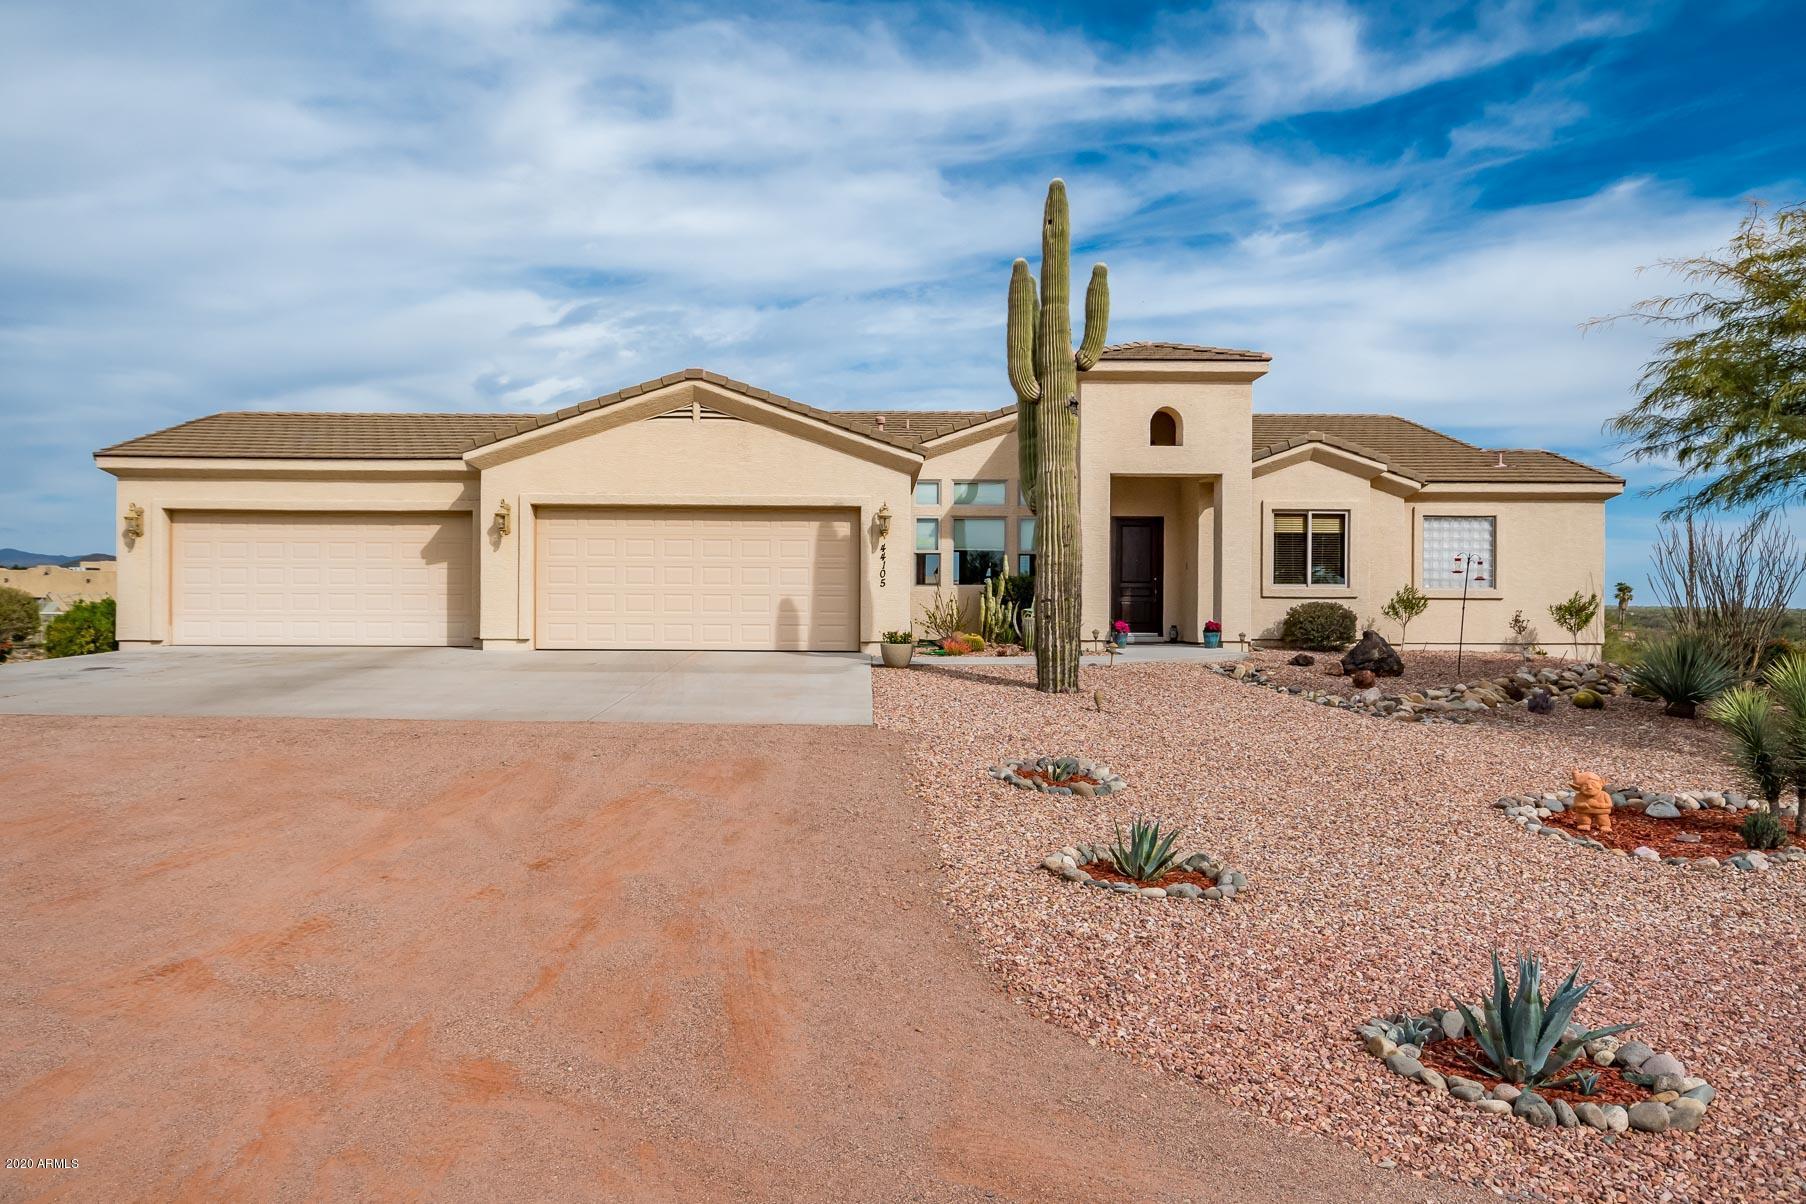 Photo of 44105 N US HWY 60 --, Morristown, AZ 85342